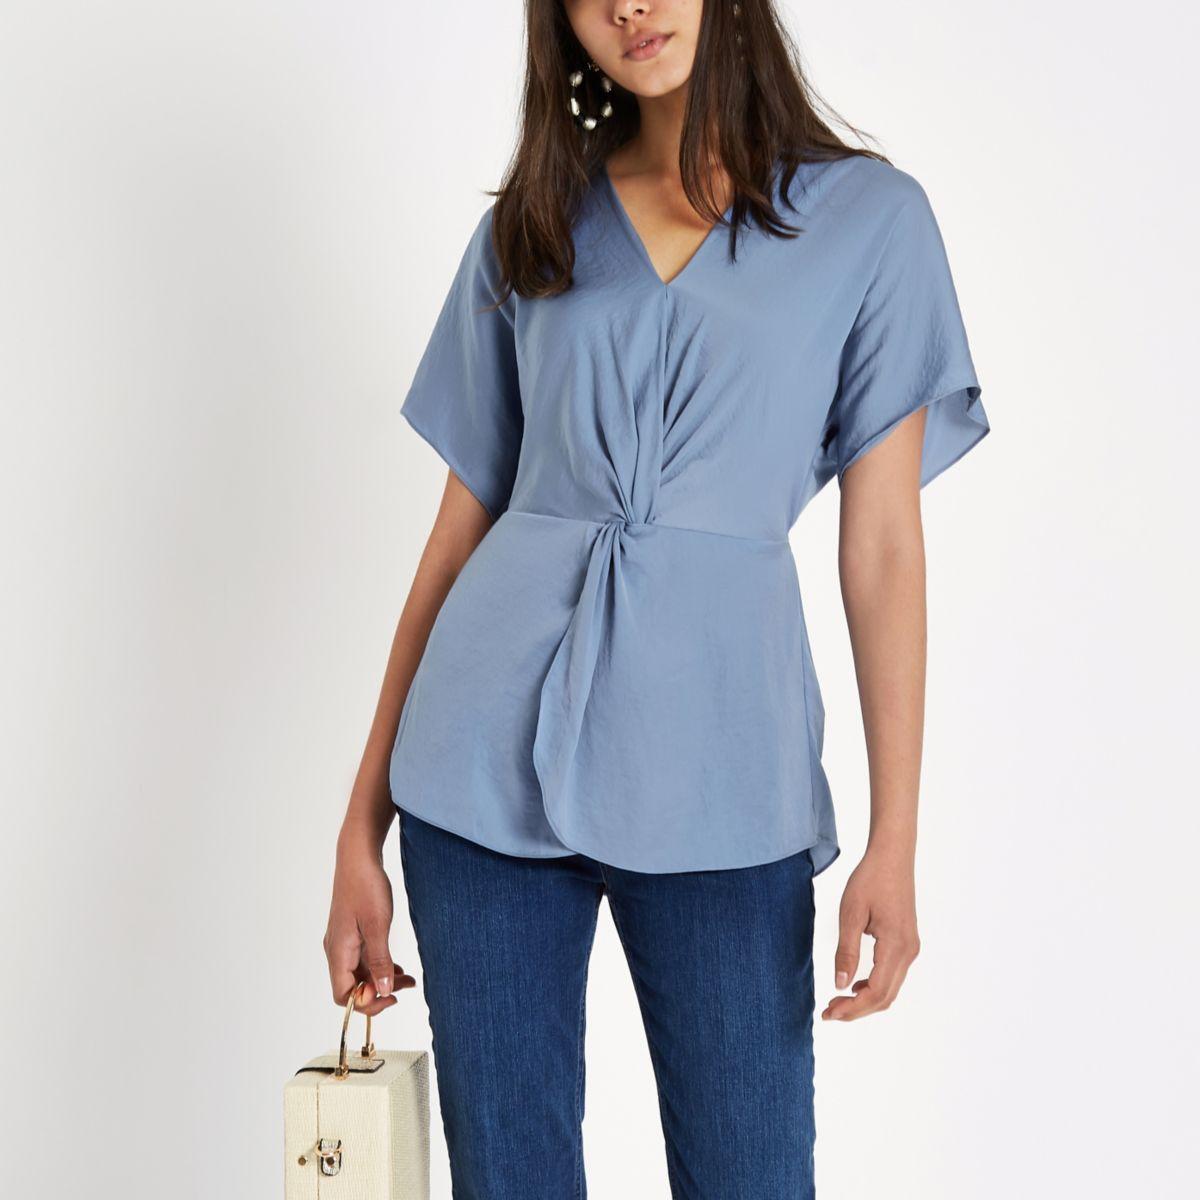 Blue satin knot front shirt